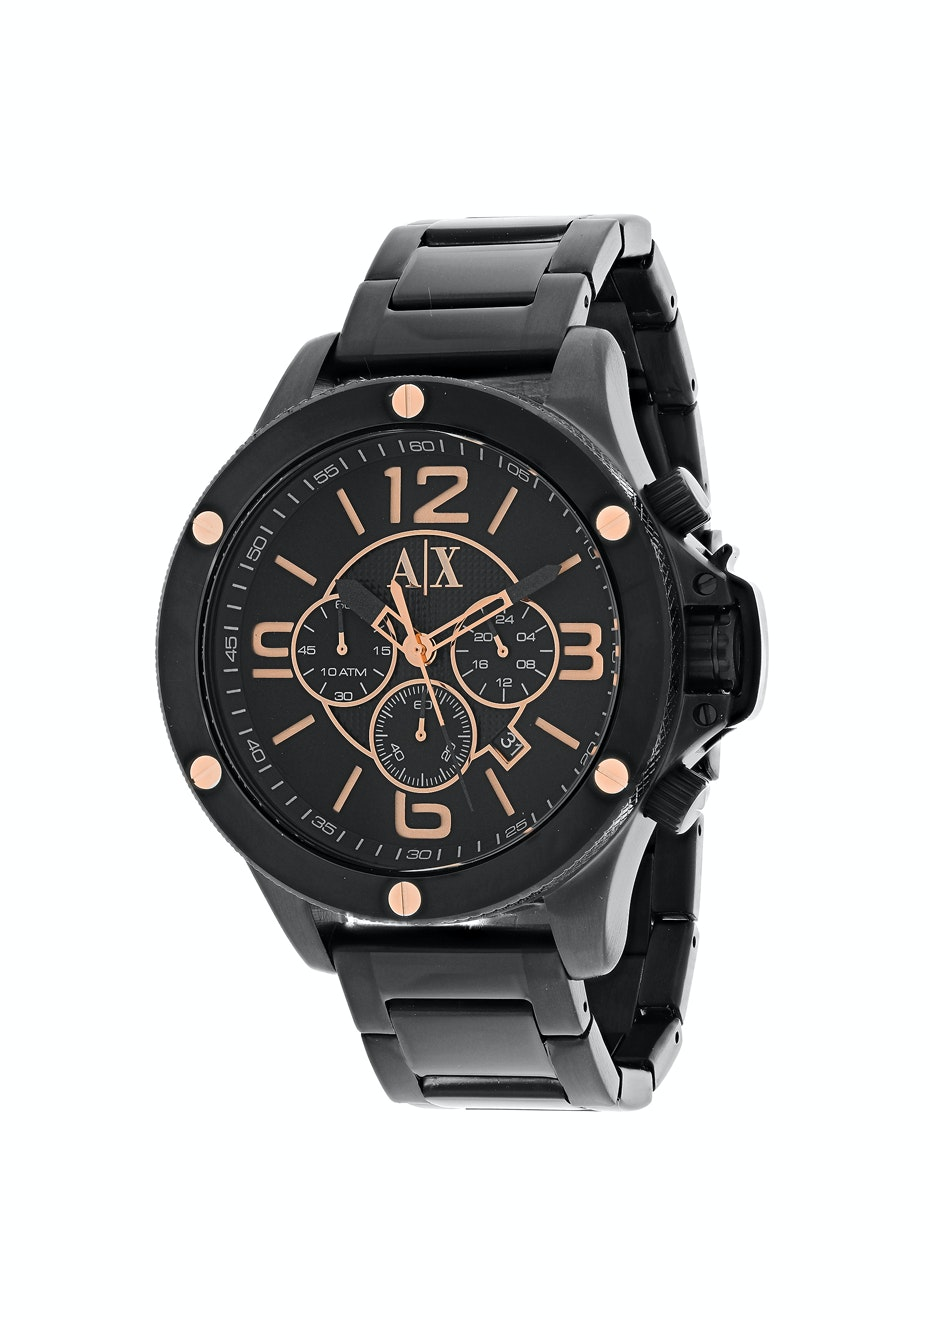 Armani Exchange Men's Chronograph - Black/Black